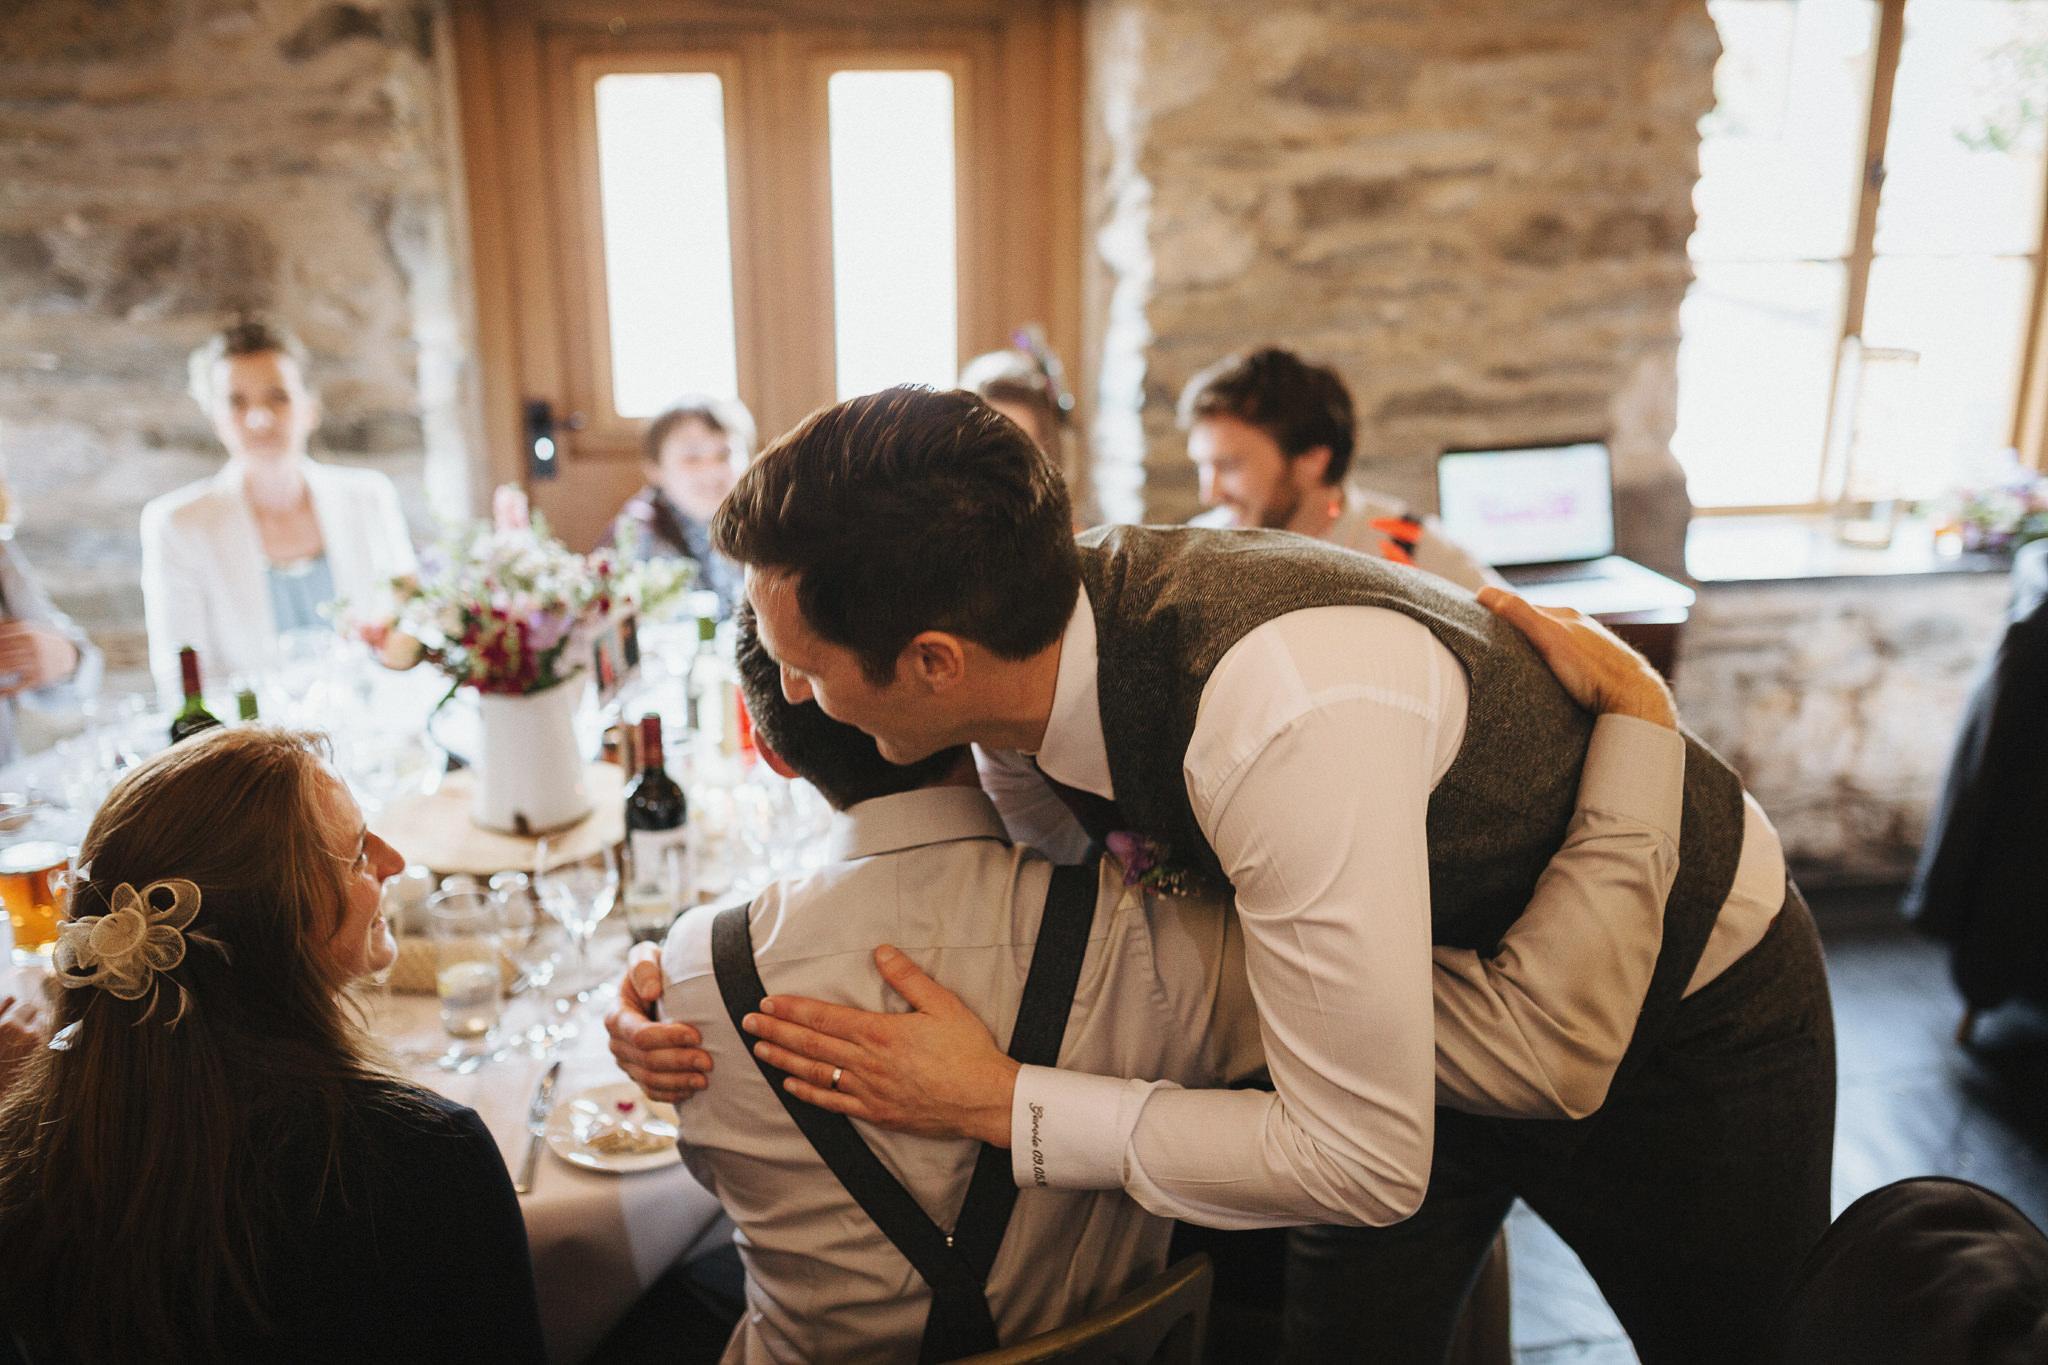 plas-isaf-corwen-north wales wedding-photography-photographer-91072